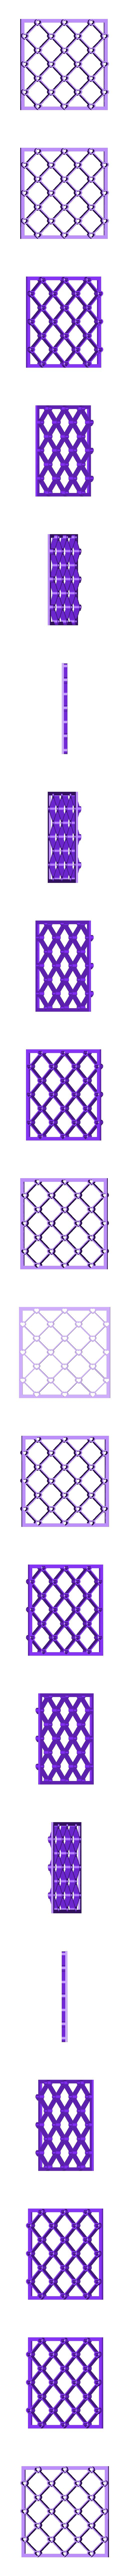 Marcador Corazón.stl Download STL file Texturizers for Porcelain / Cakes / Cookies • 3D printer template, Ushuaia3D